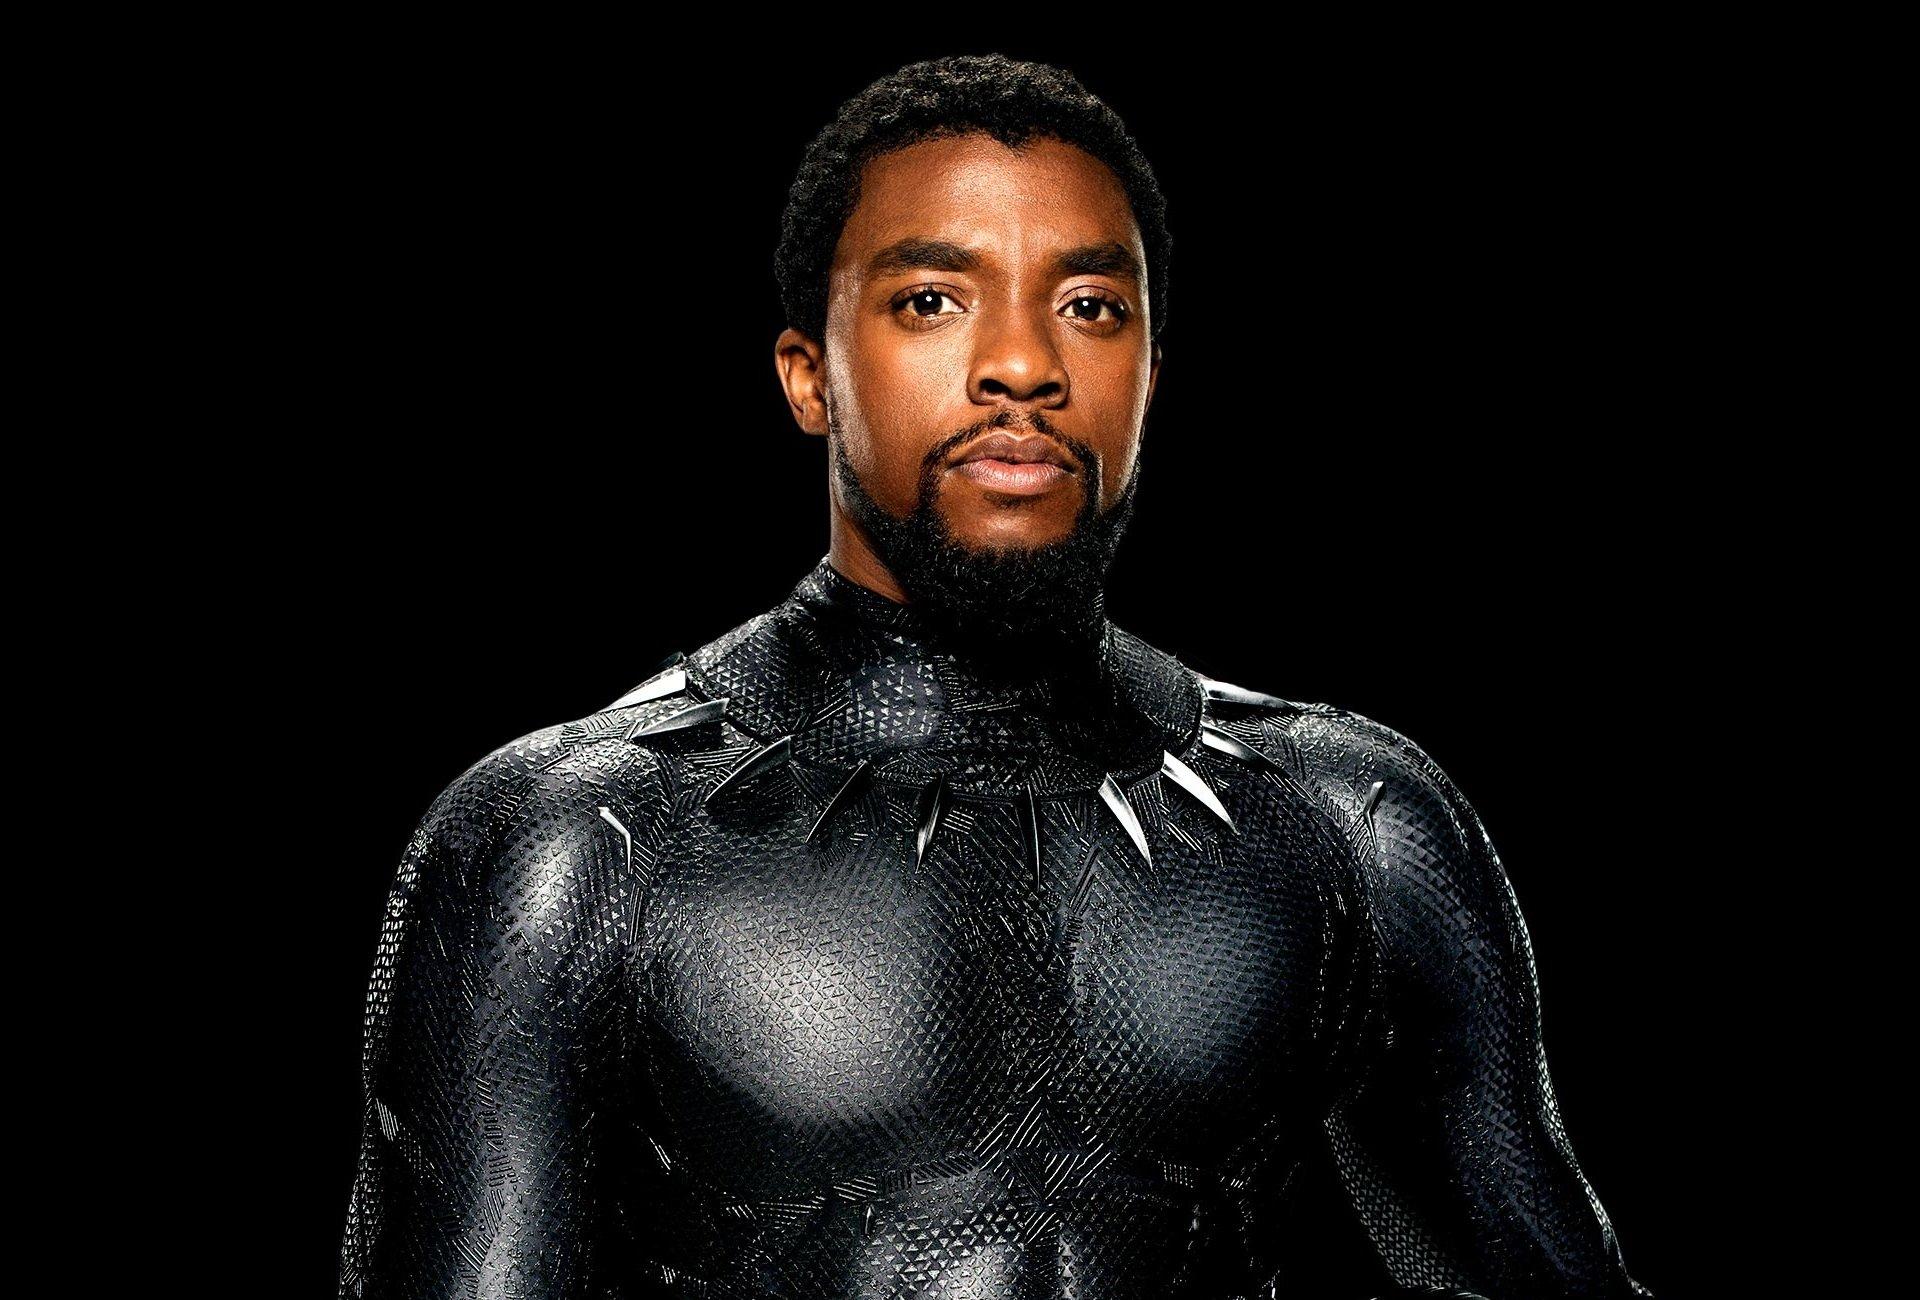 Movie - Black Panther  Chadwick Boseman Wallpaper